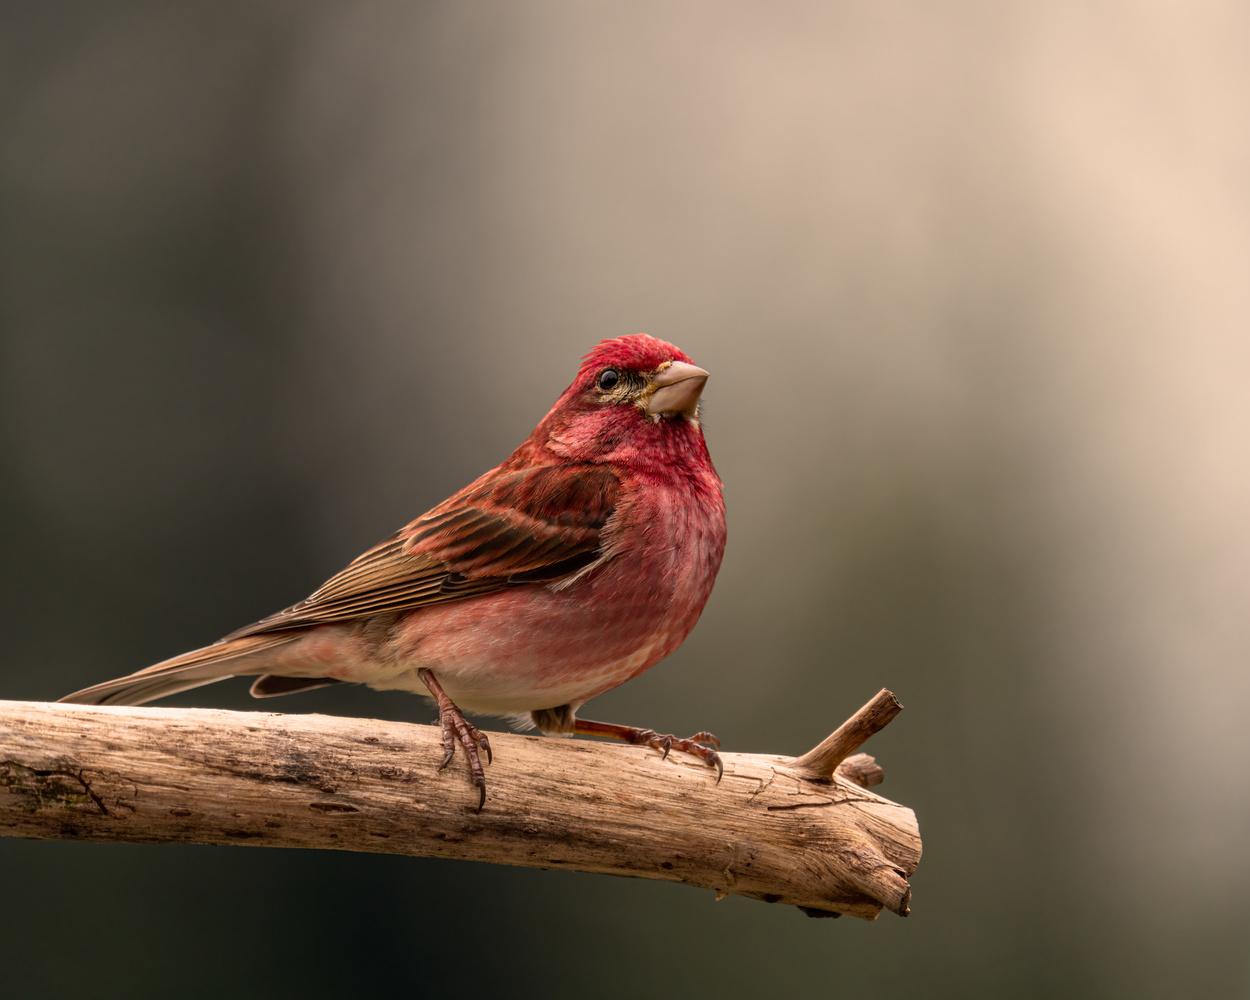 Finch by Skyler Ewing